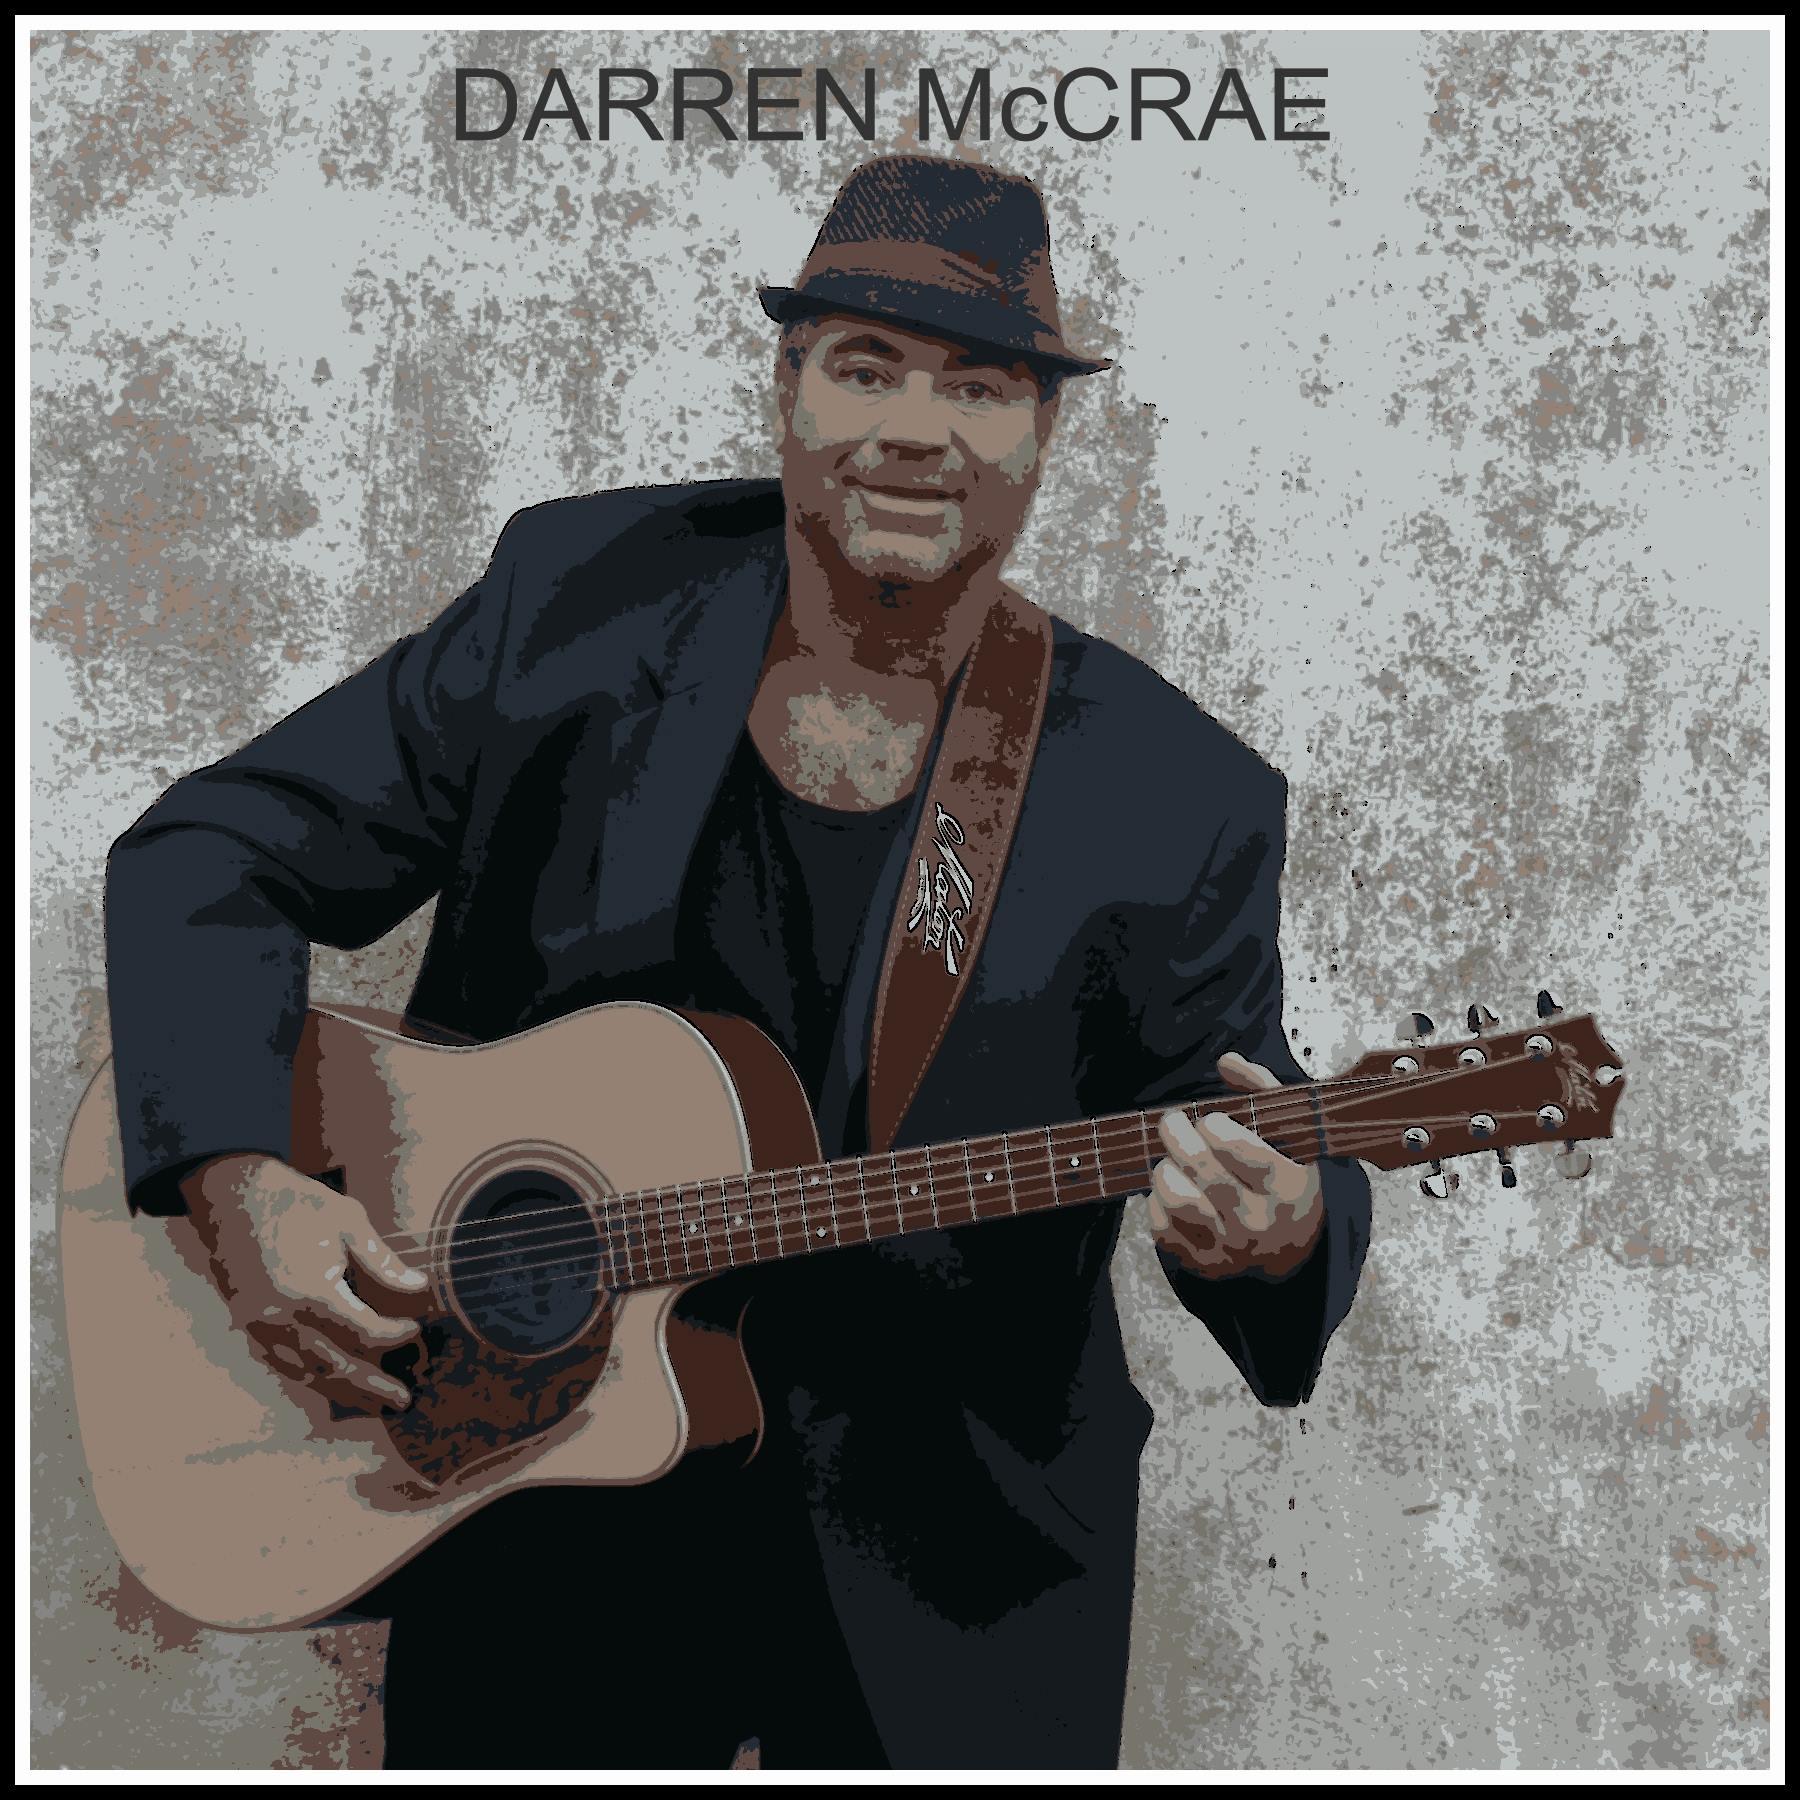 Darren McCrae